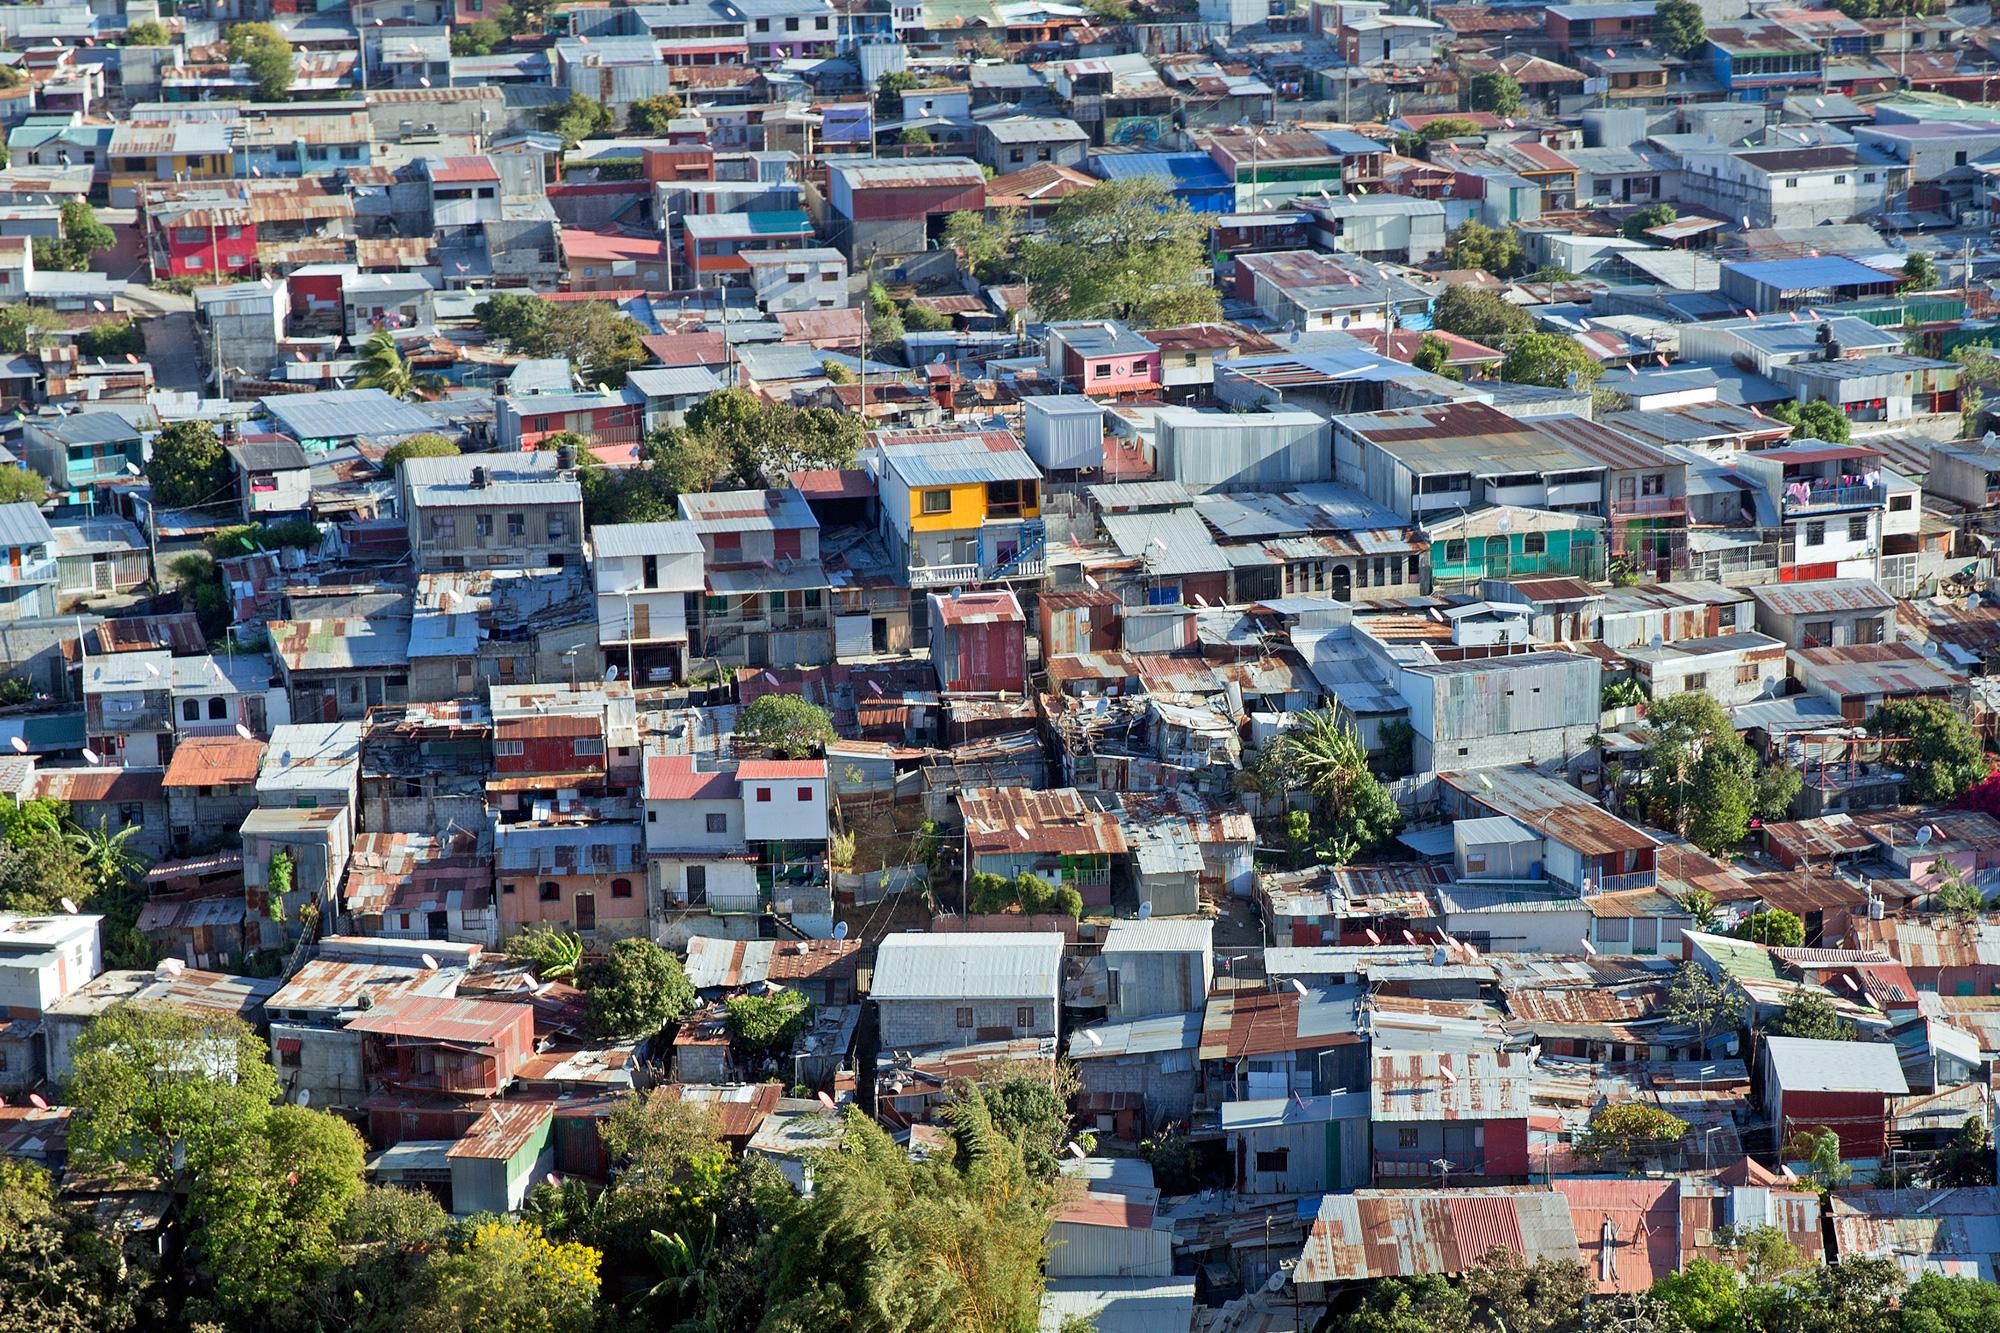 costa rica san jose aerial view adstk